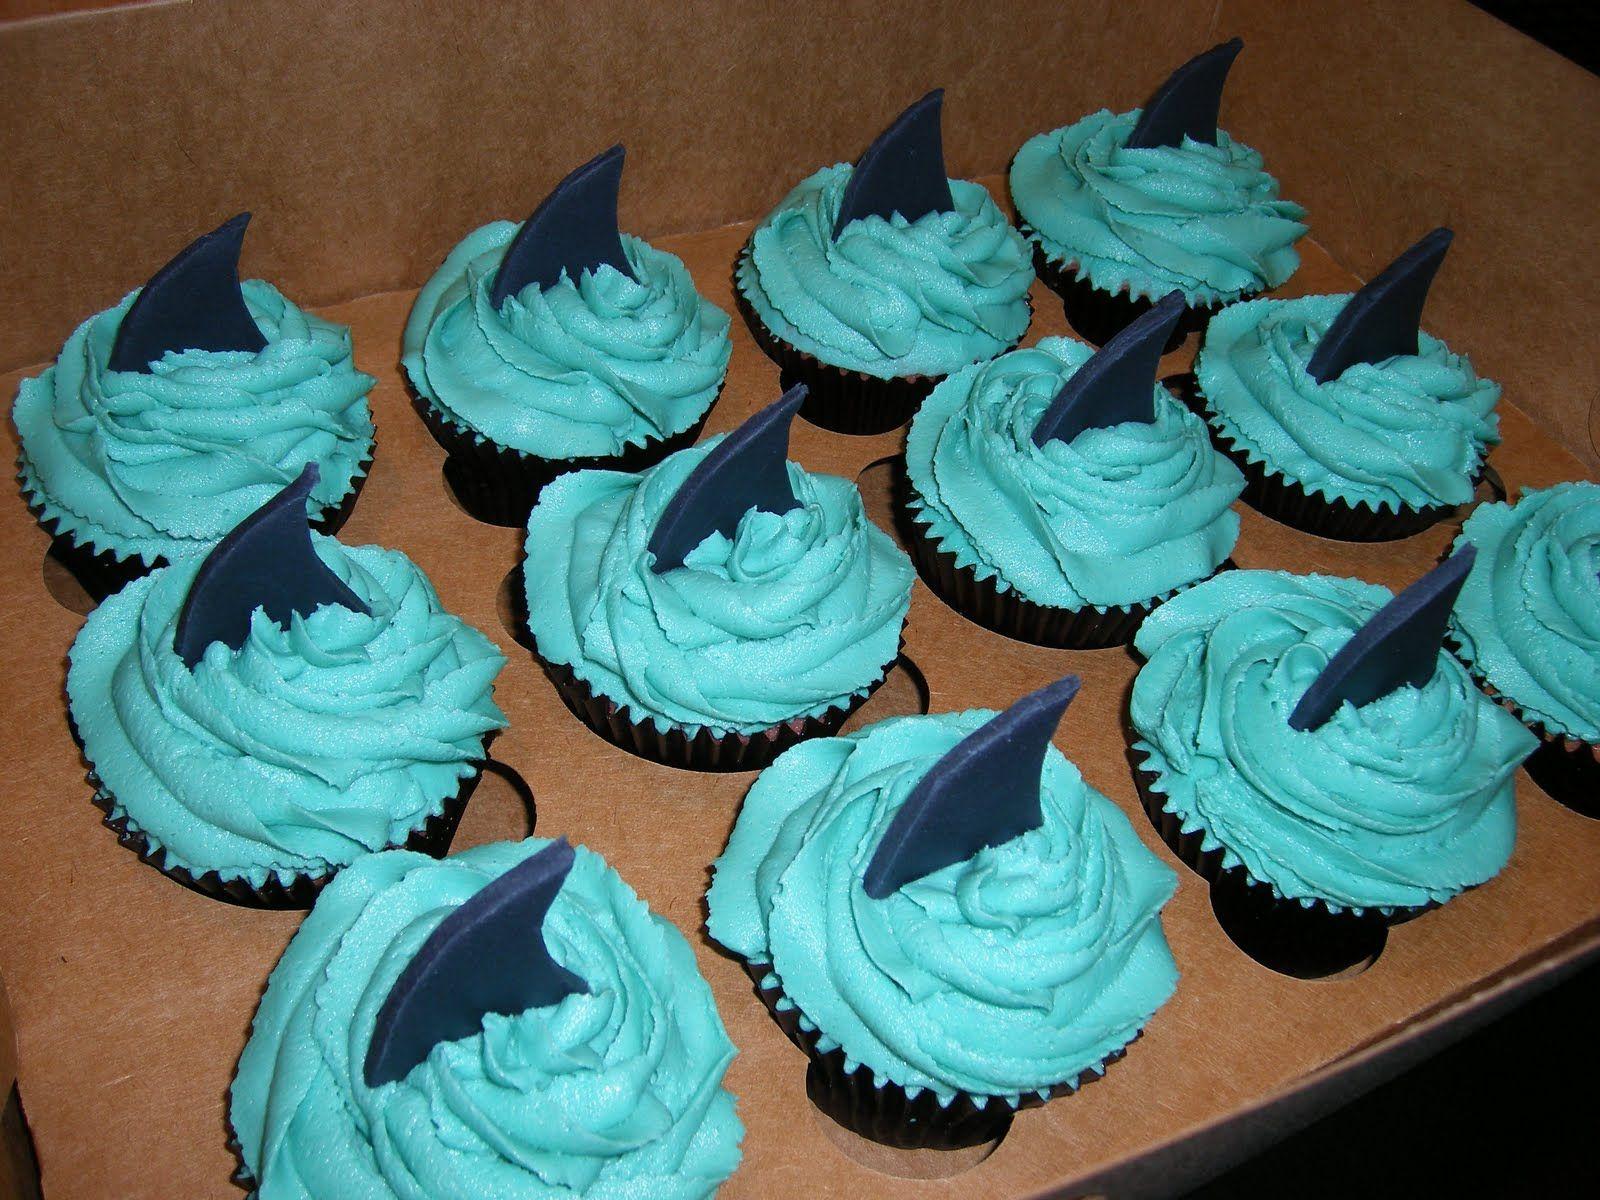 Cupcake Decorating Ideas Birthday Boy : Boys Birthday Cakes creative Birthday cupcakes for a ...